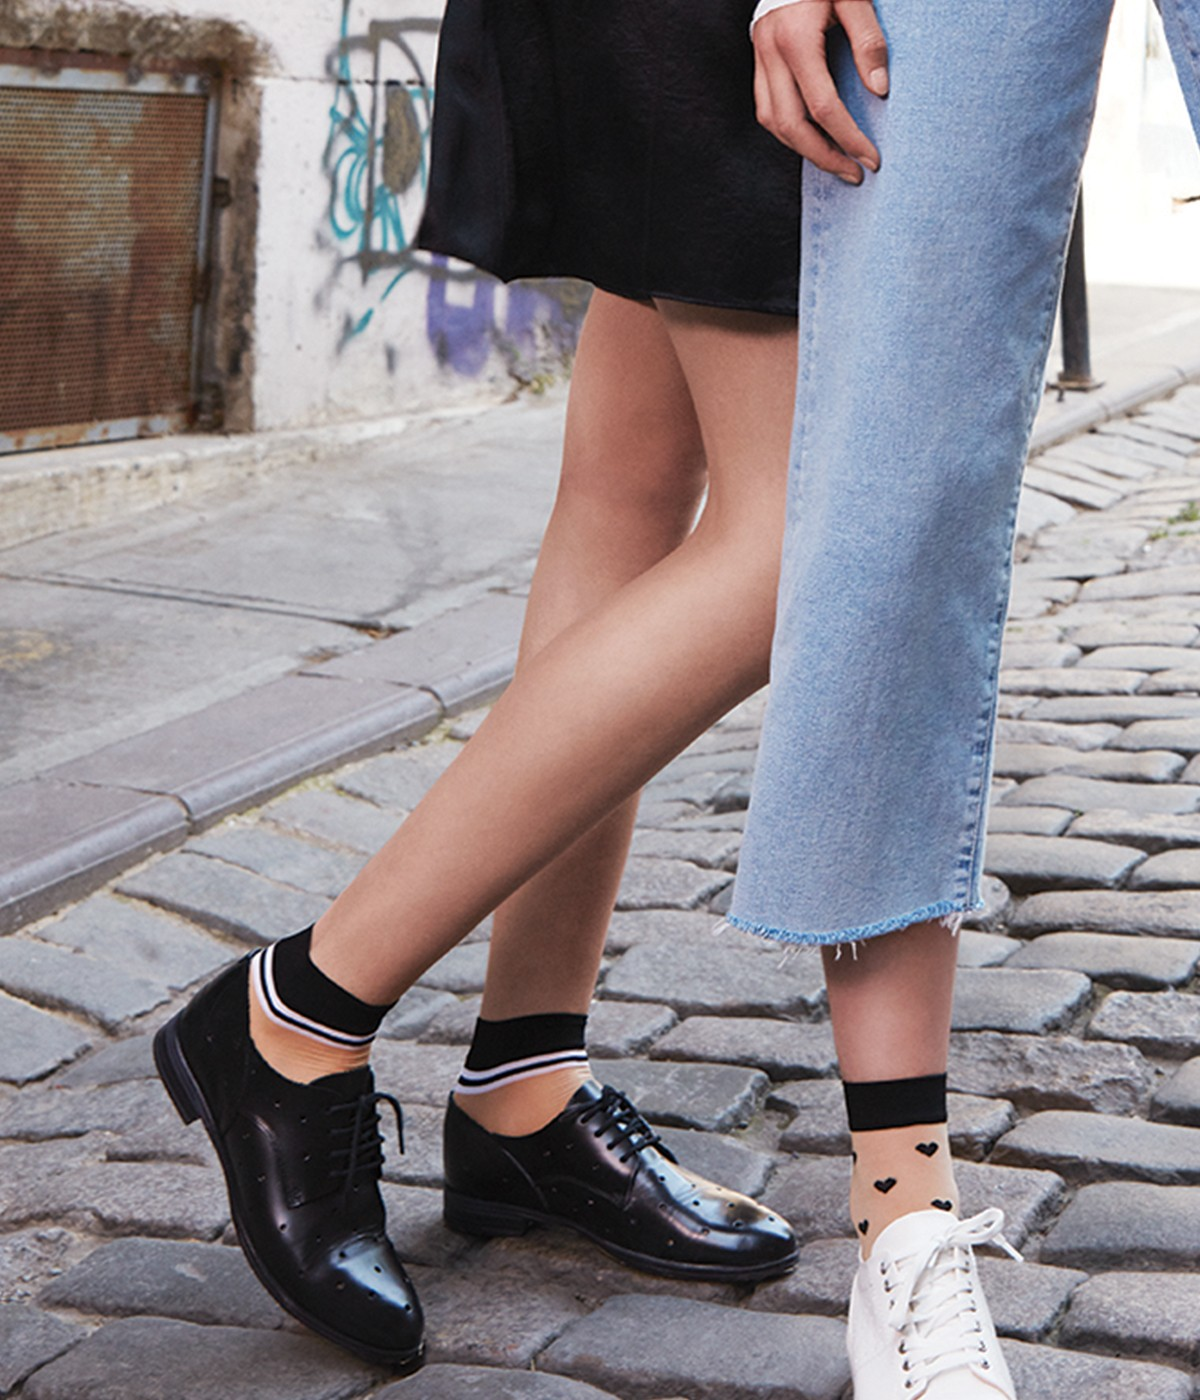 Stylish Socks